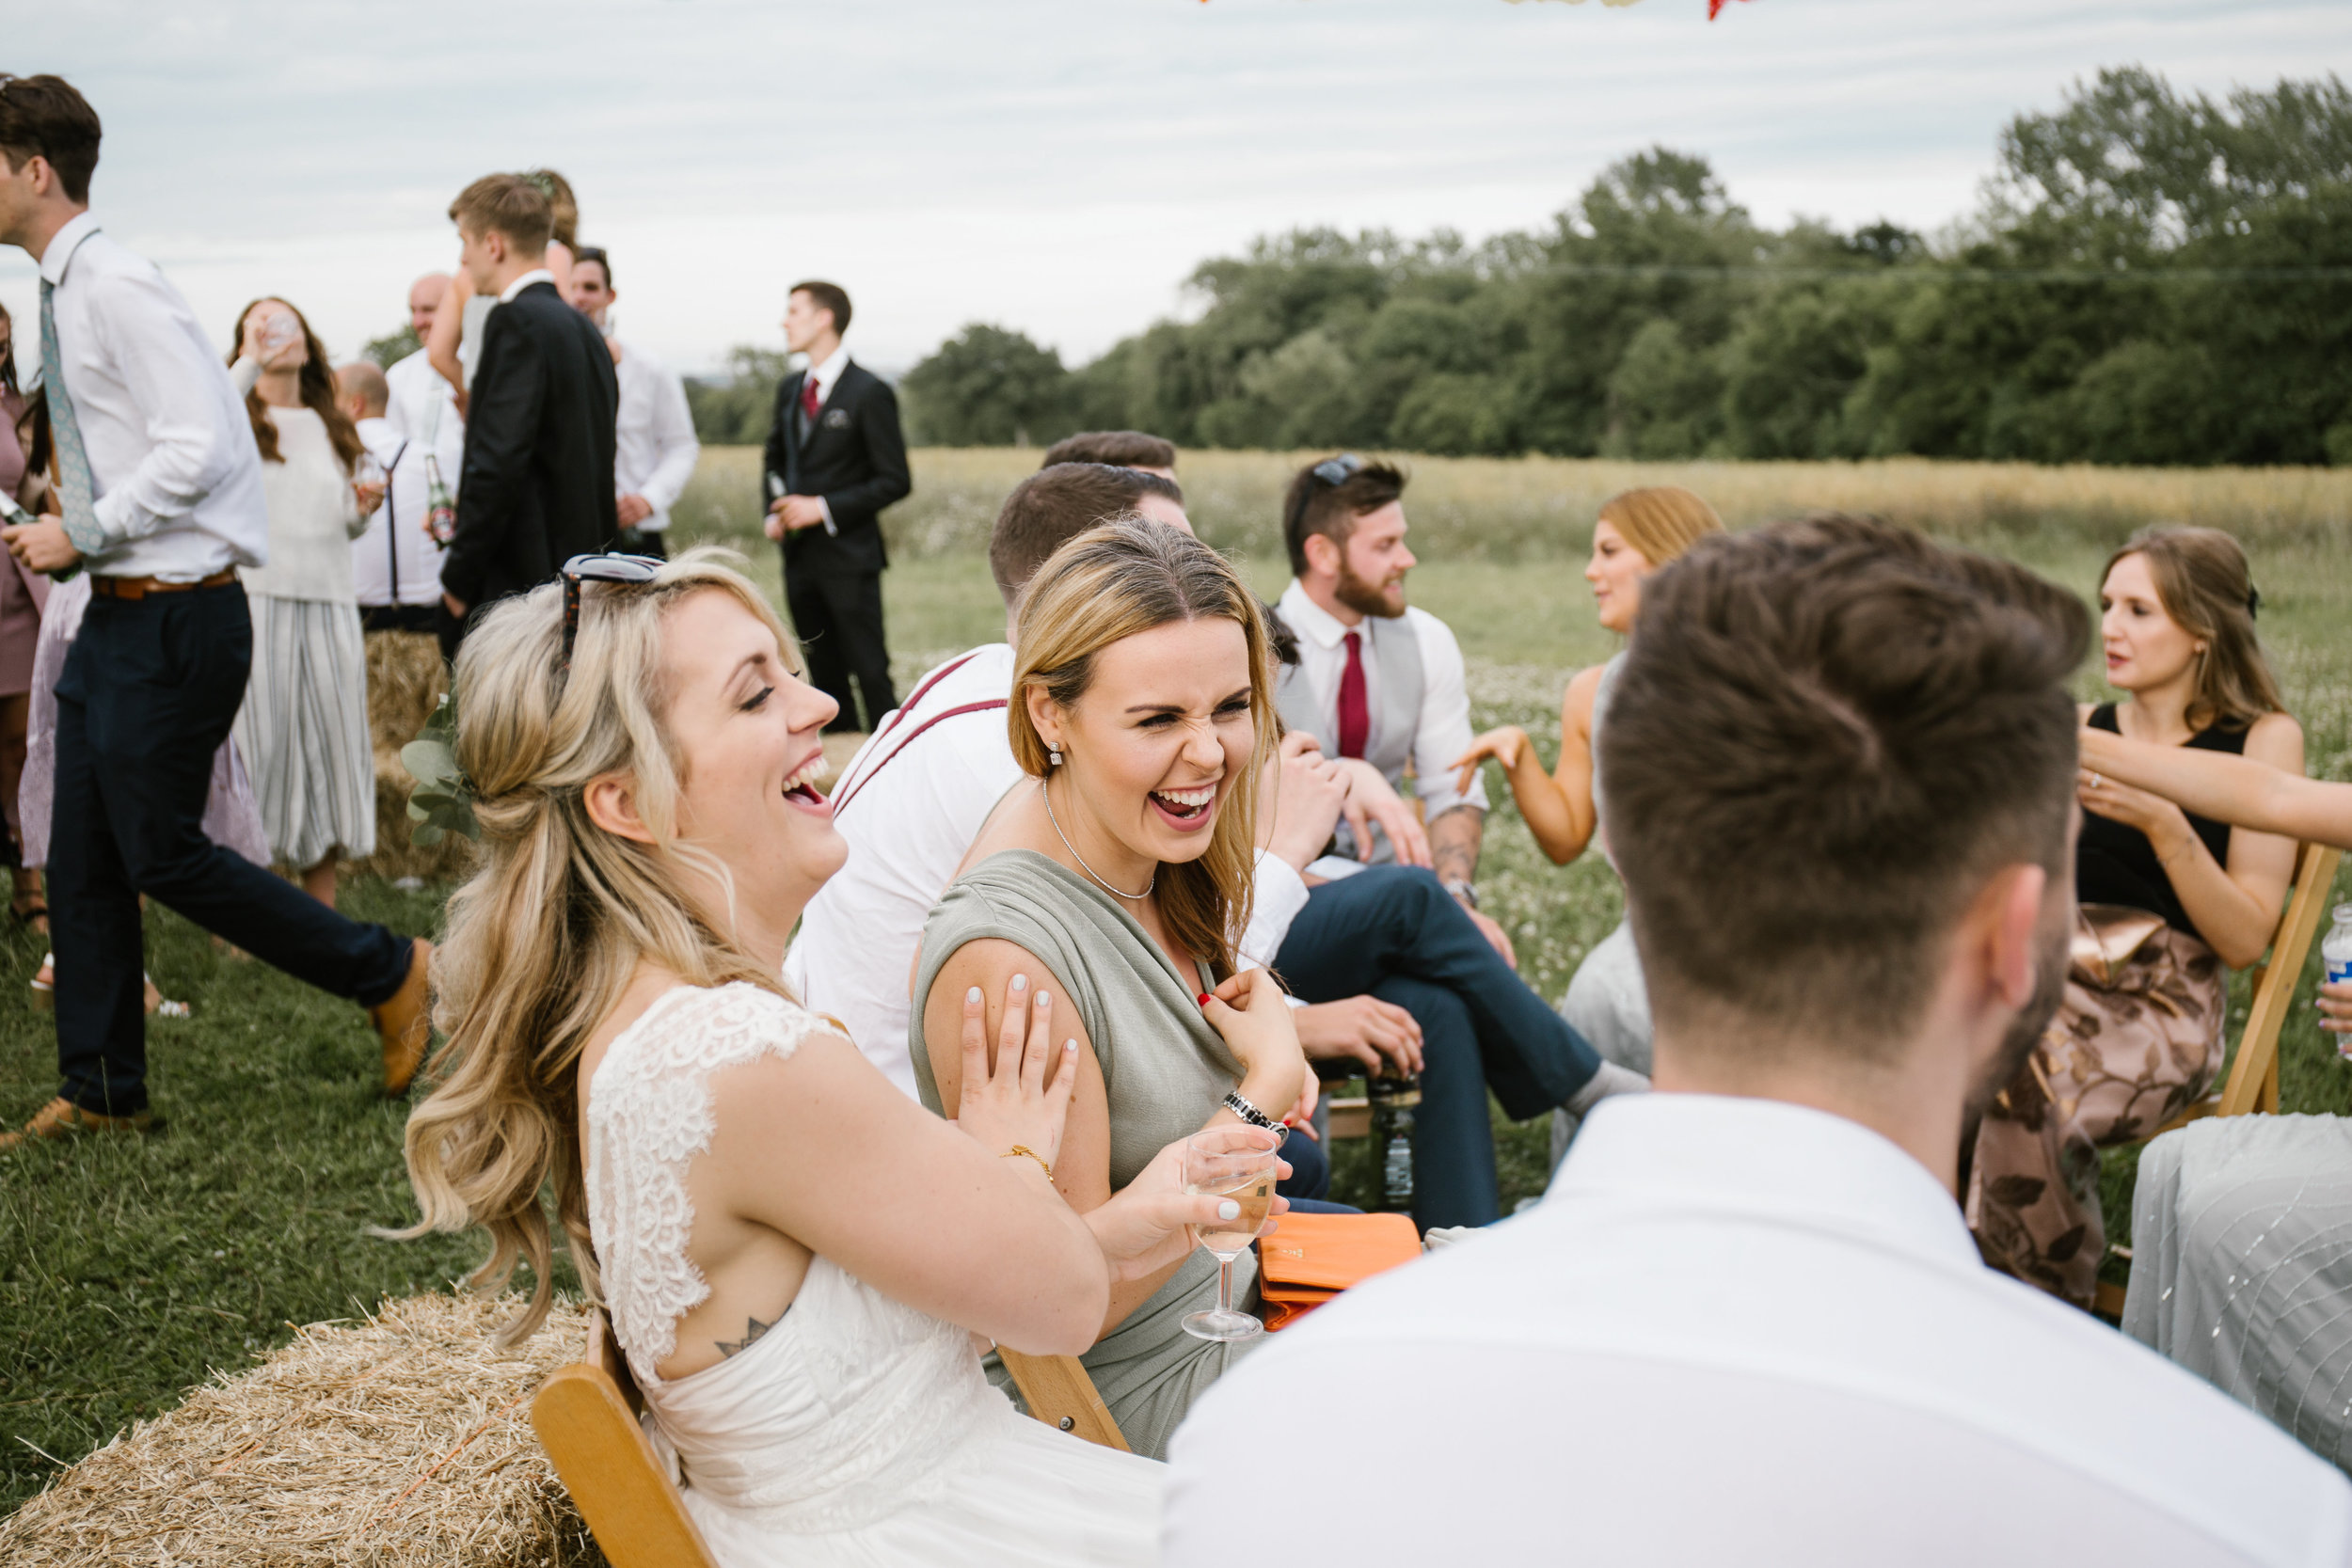 Cotswolds wedding, cotswolds wedding photographer, DIY wedding, forest wedding, marquee wedding, fun wedding, alternative wedding-390.jpg